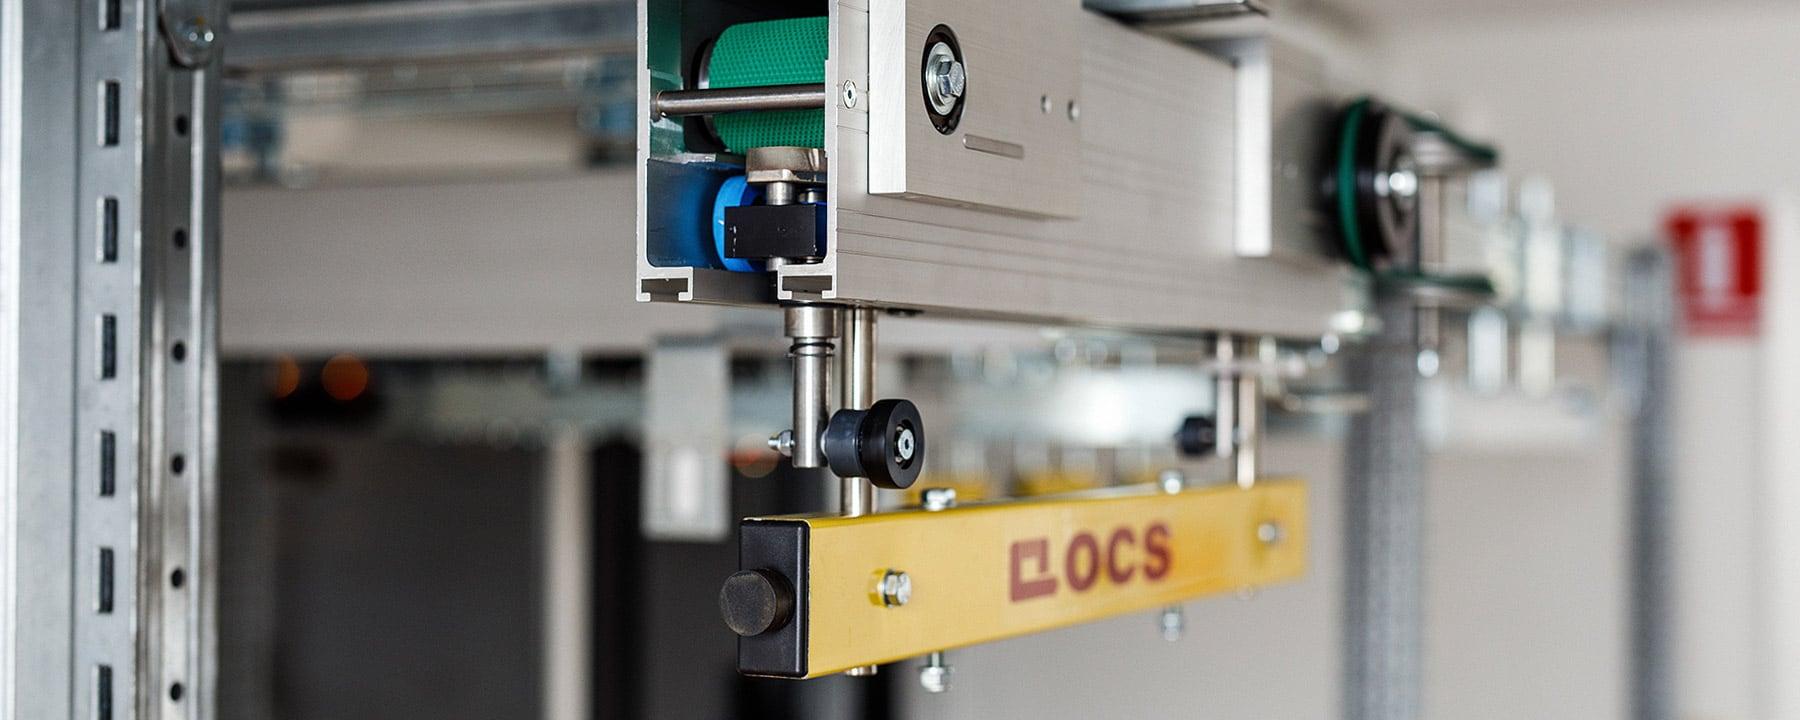 Overhead Conveyor System – OCS 150